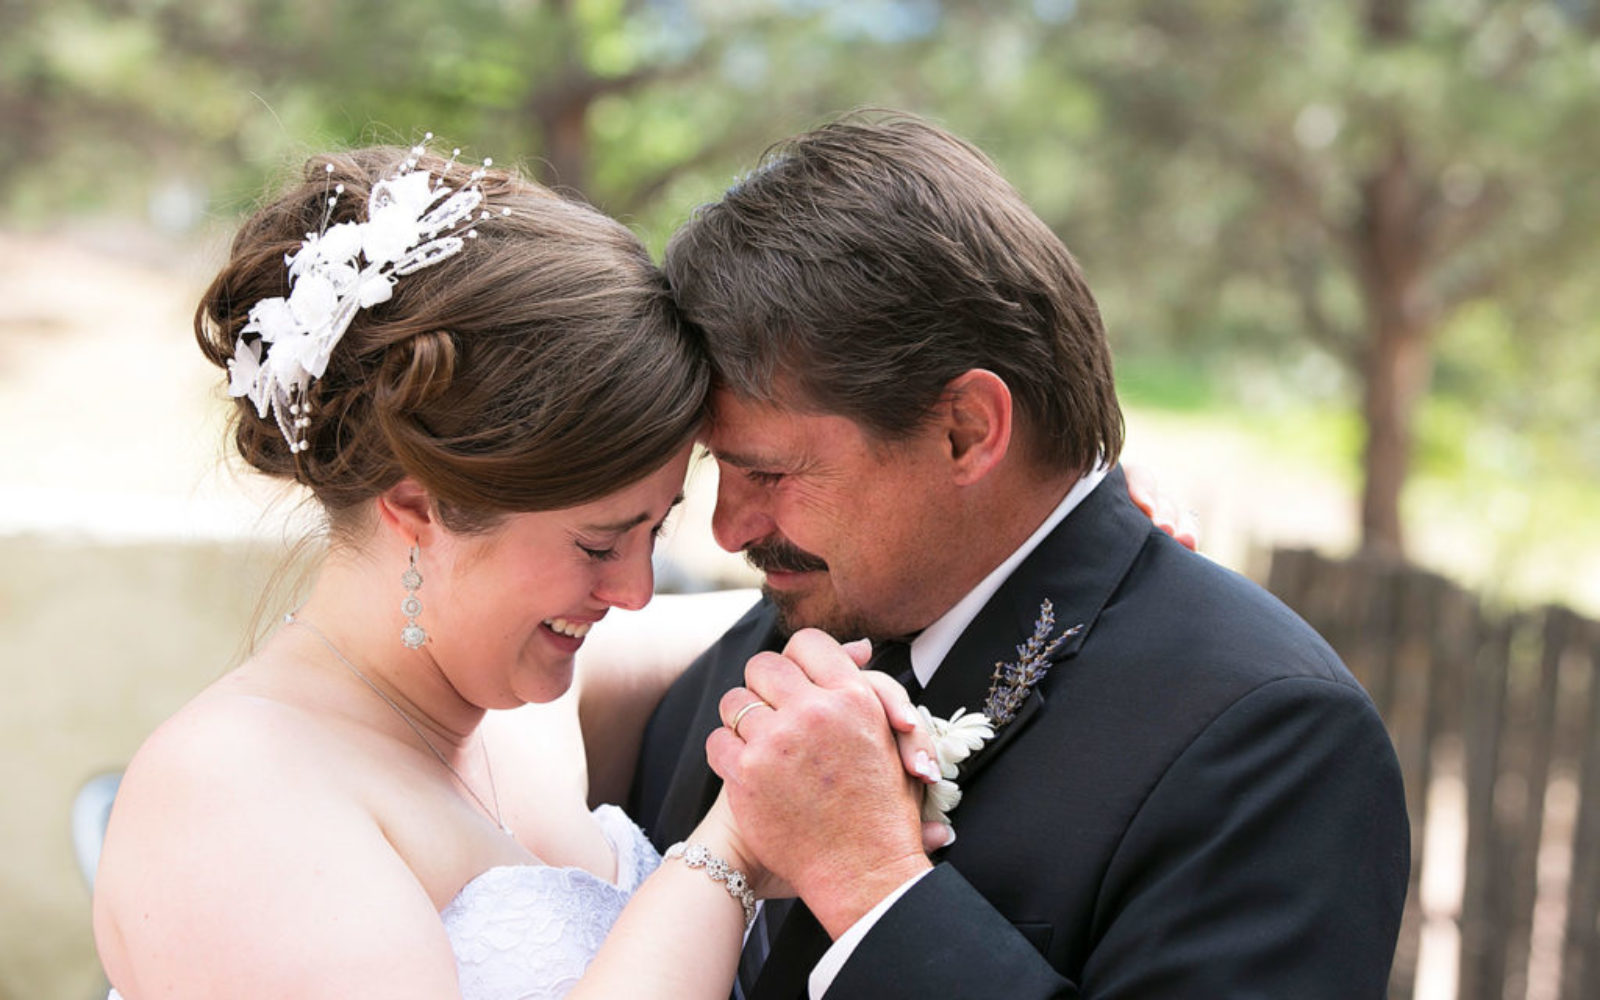 weddingphotographycoloradosprings_62-1024x640